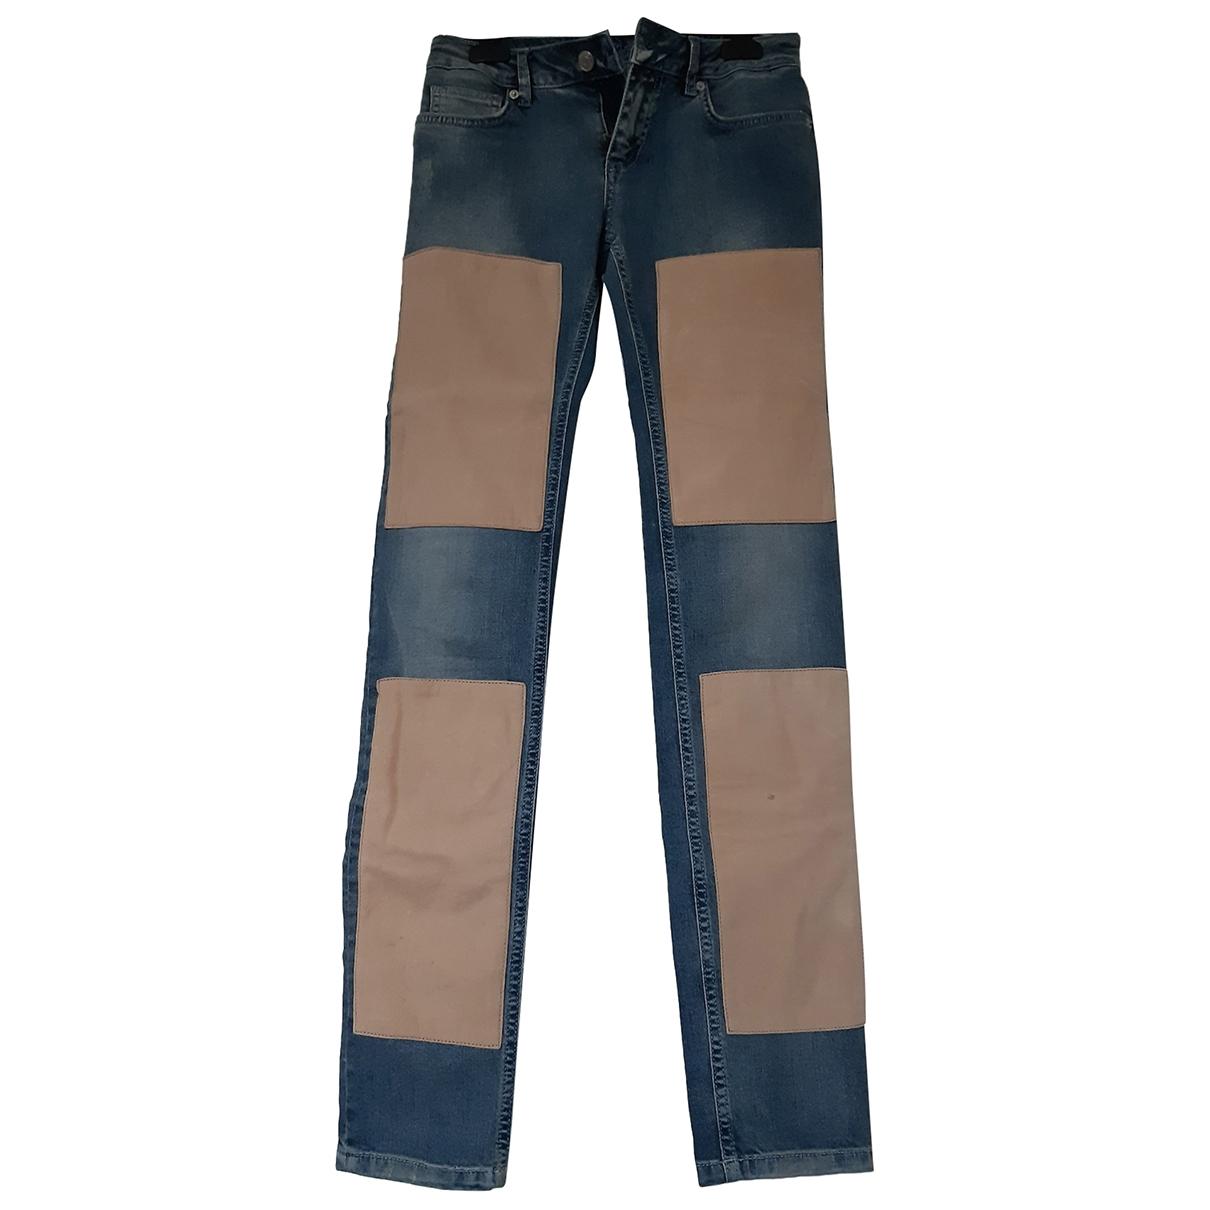 Zadig & Voltaire \N Blue Denim - Jeans Jeans for Women 36 FR